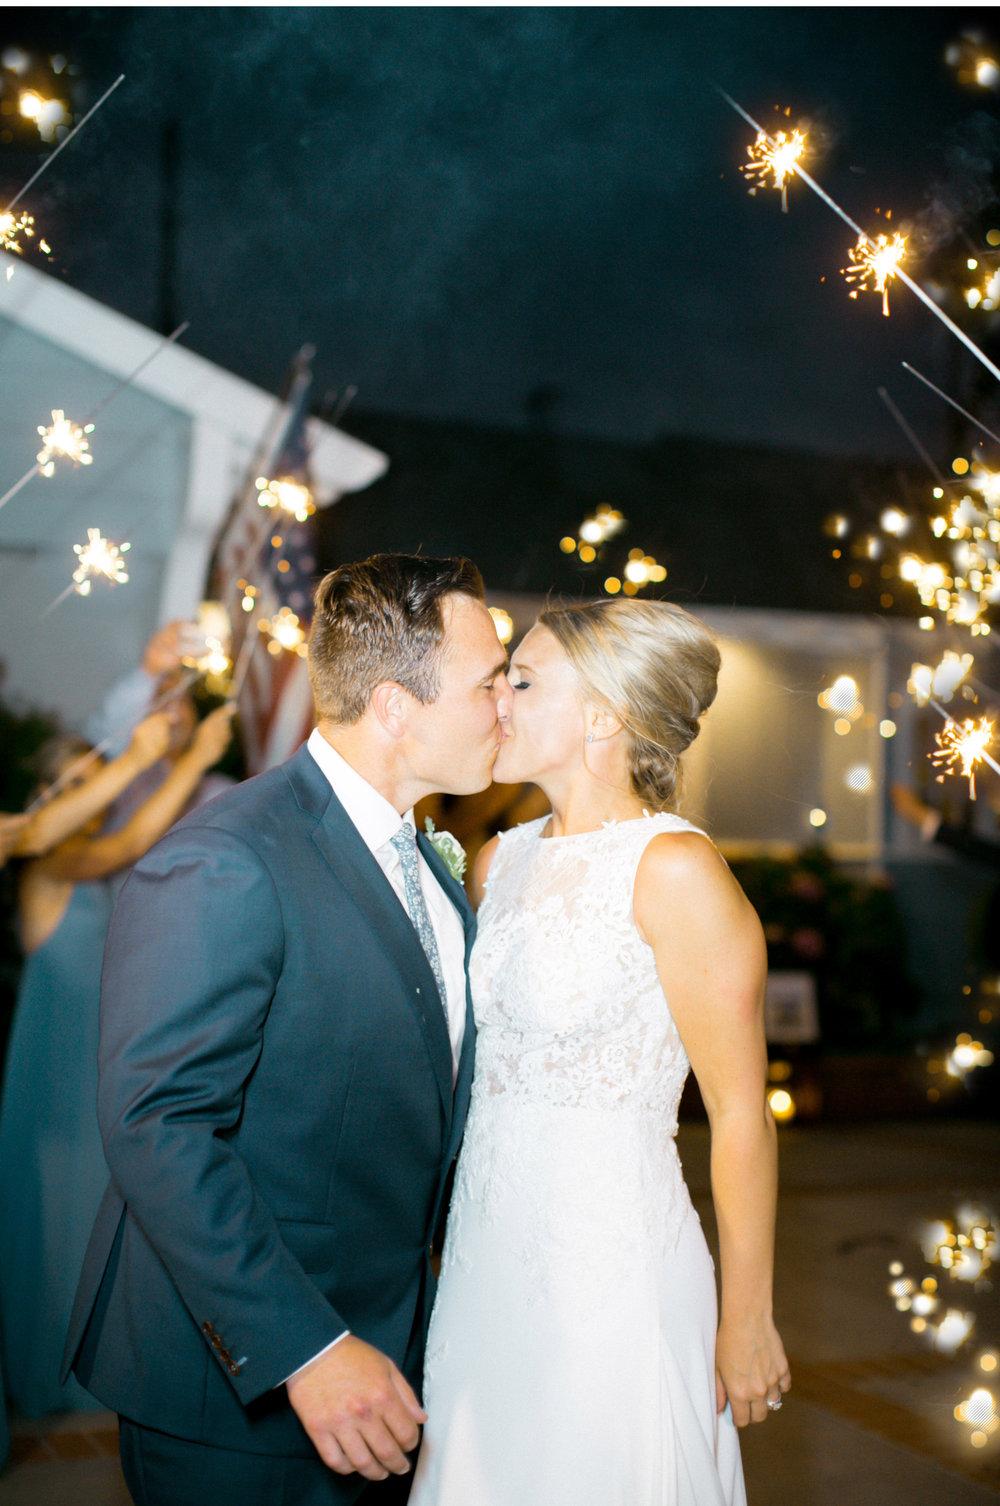 Malibu-Wedding-Photographer-Natalie-Schutt-Photography-Fine-Art-Film-Photography_02.jpg